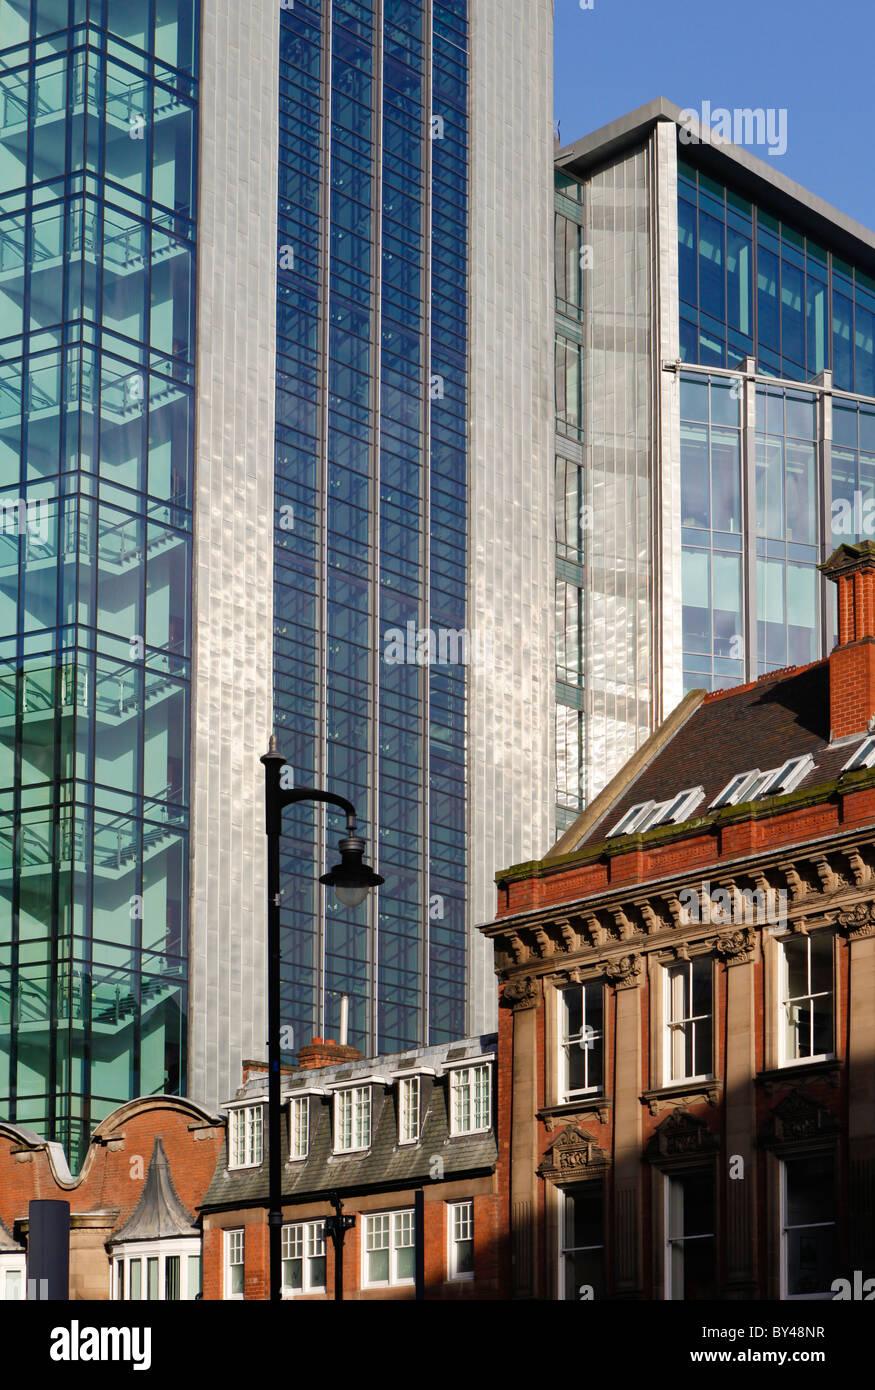 Offices of 45 Church Street, Financial Quarter, Birmingham, West Midlands, England, UK - Stock Image